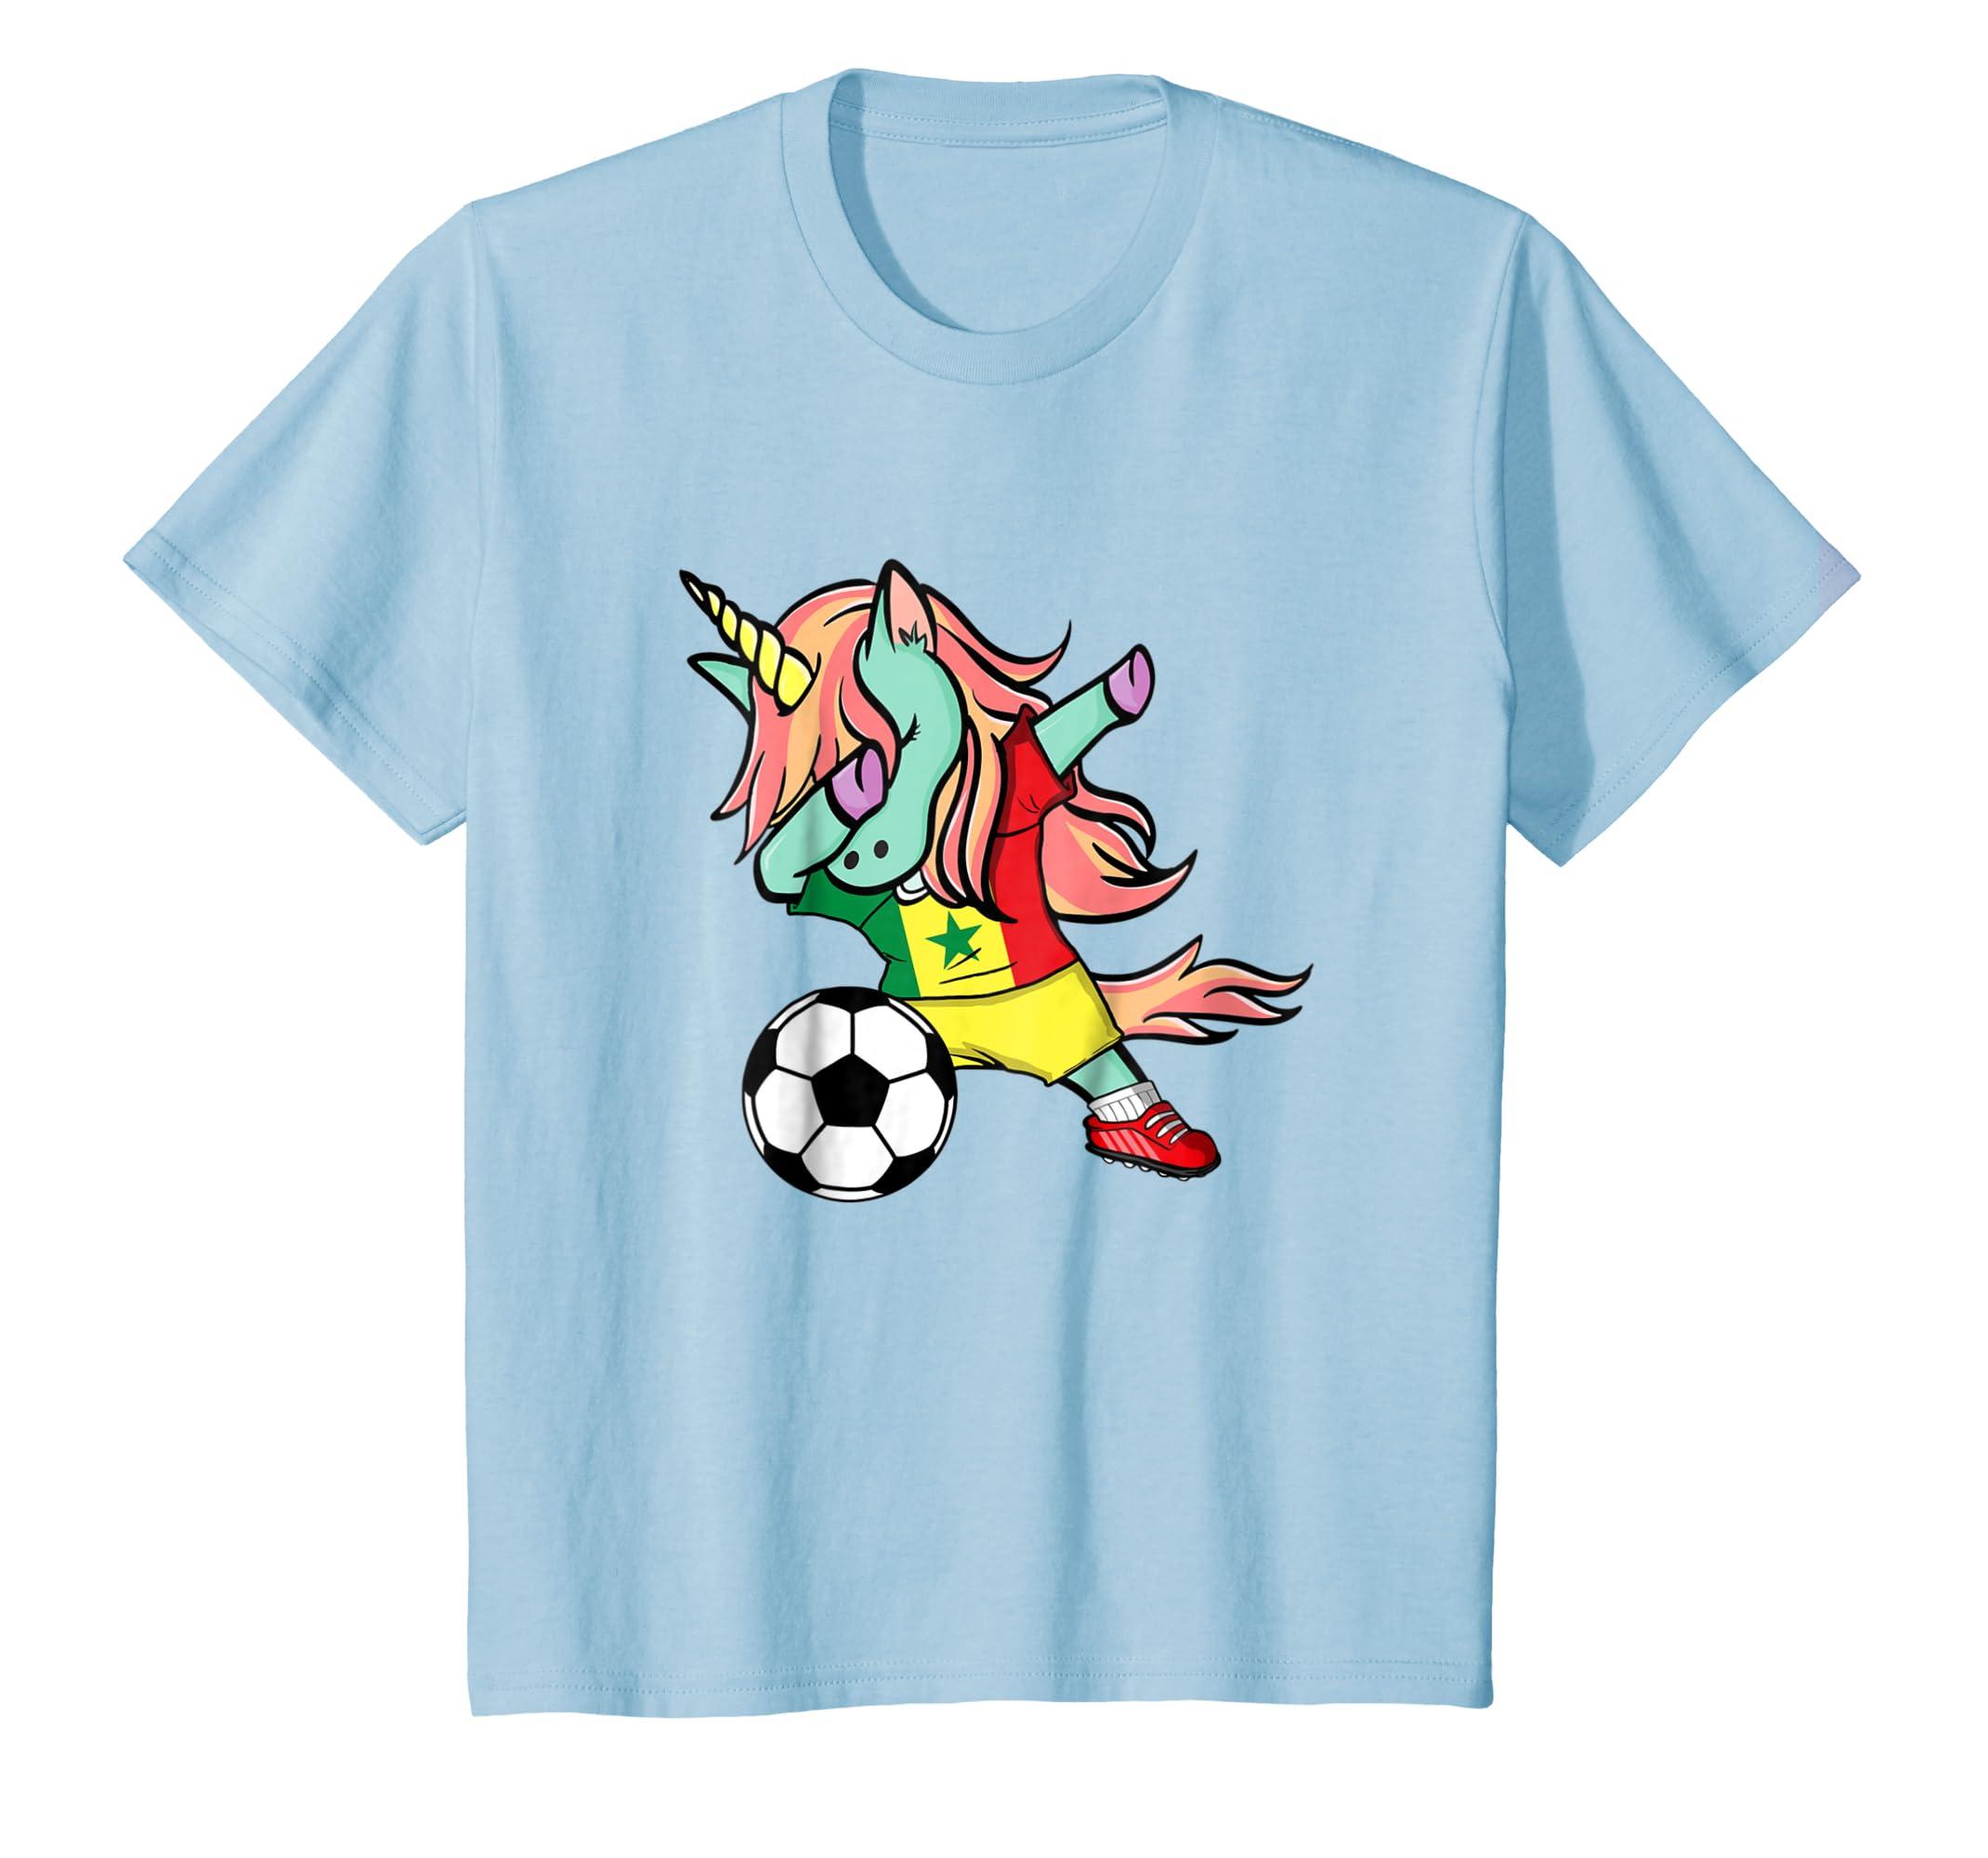 d71ba6e80 Amazon.com  Dabbing Unicorn Soccer Senegal Jersey Shirt 2018 Football   Clothing